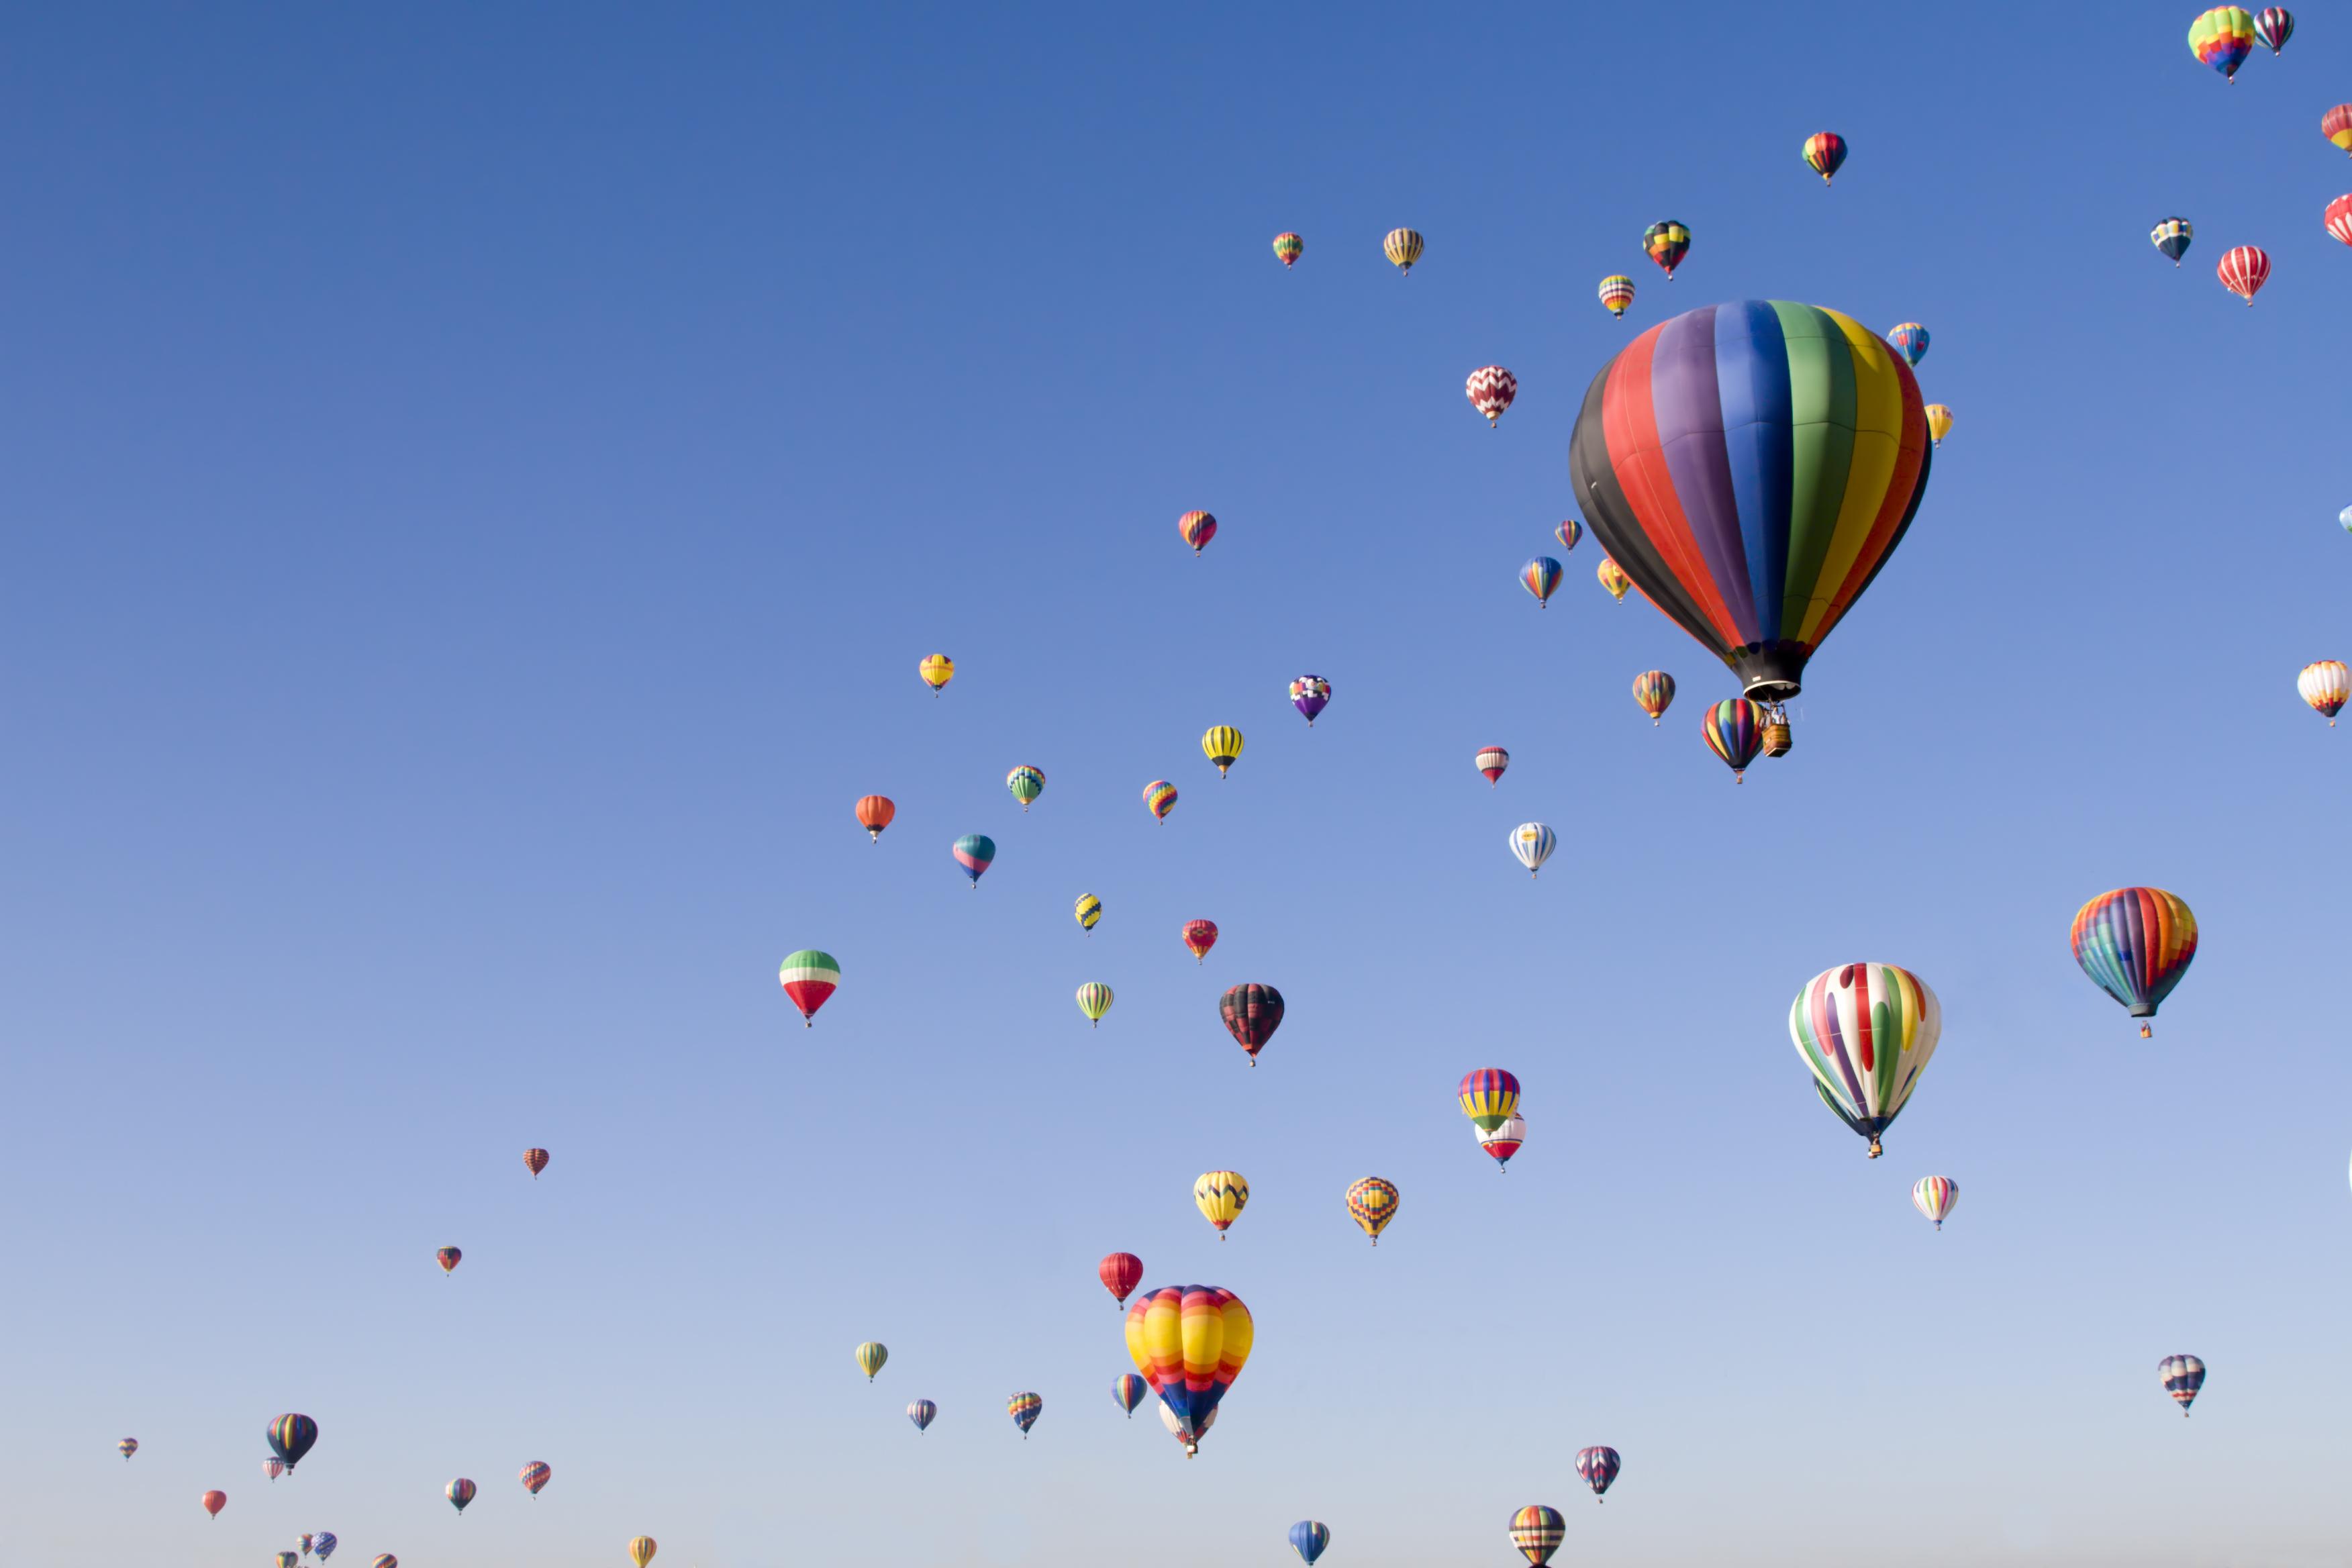 Success hot air balloons